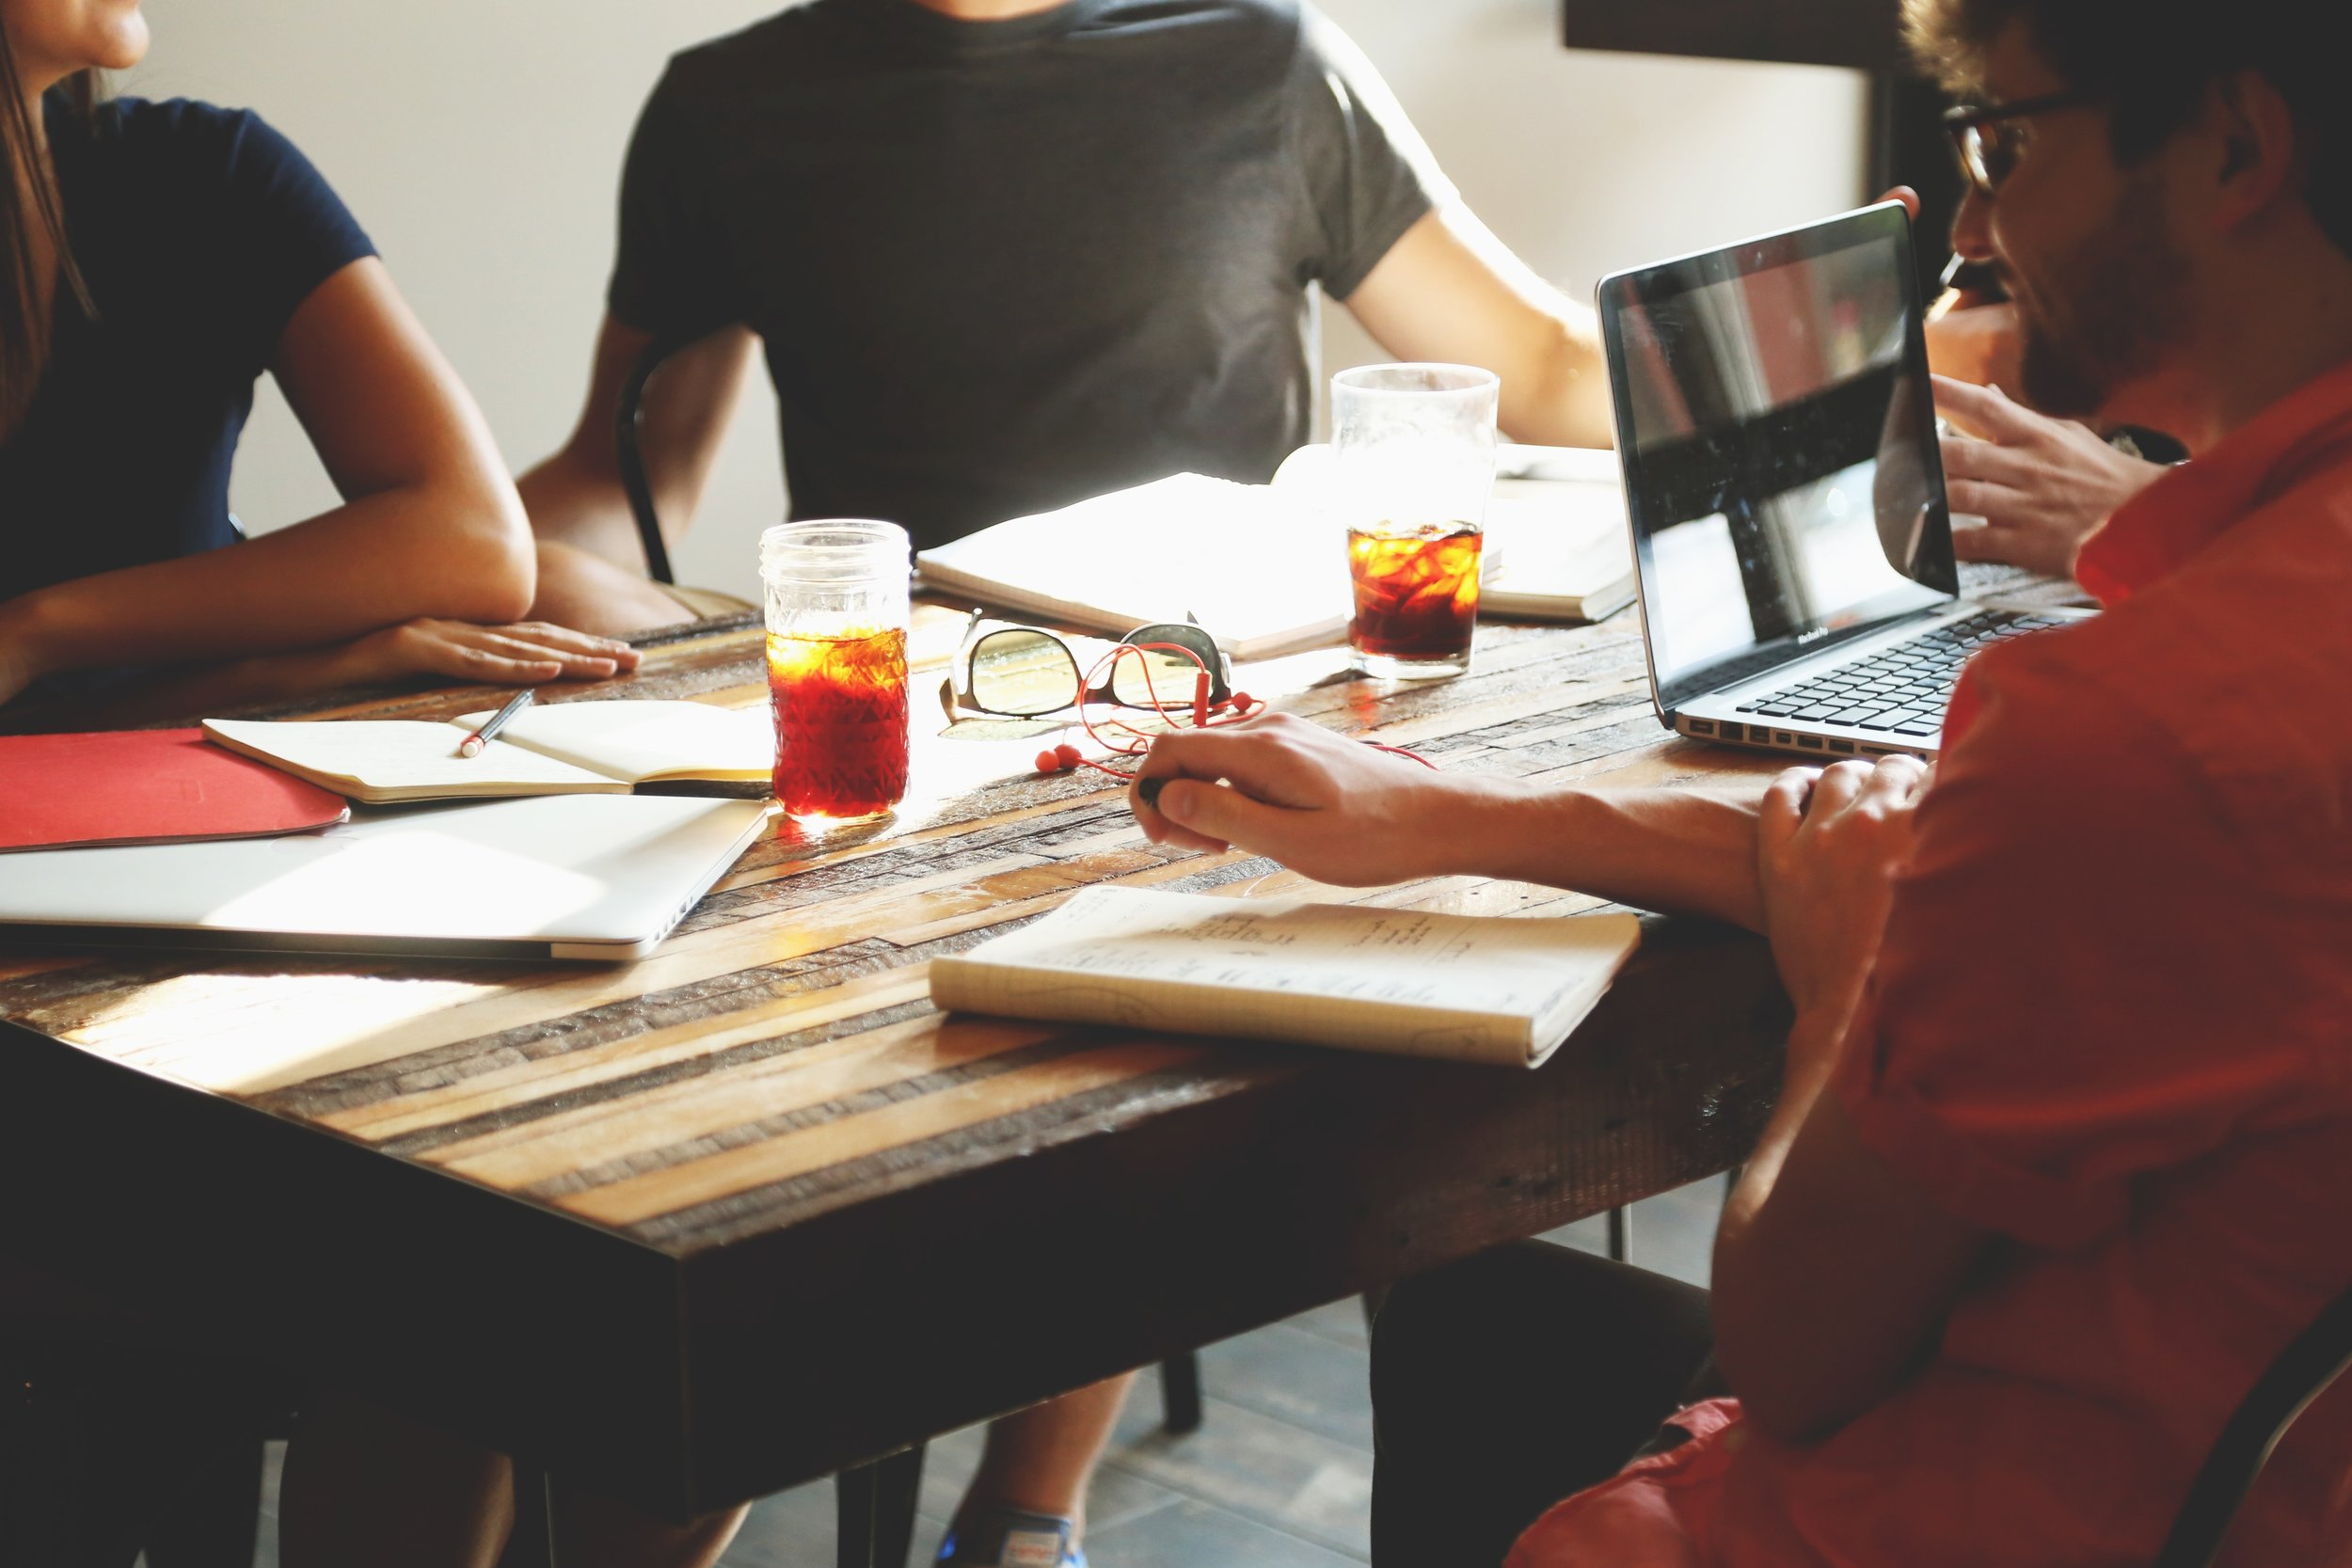 team-meeting-to-plan-company-work